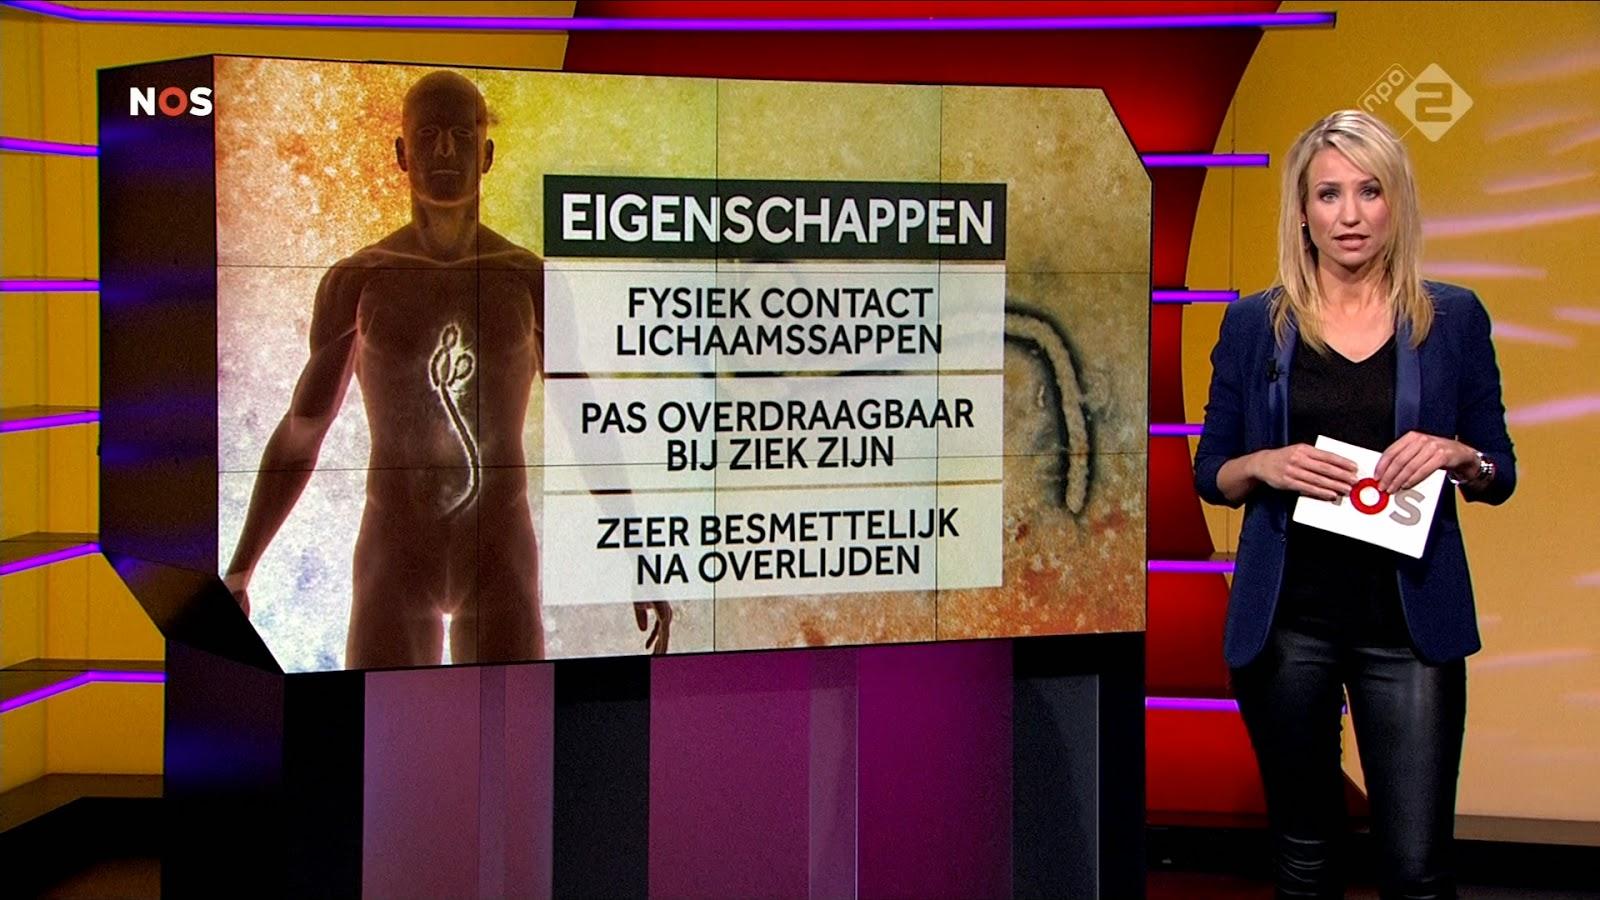 ... en Joost Karhof verzorgen NOS-special rondom Ebola: Feiten & Fabels: dionnestaxfan1.blogspot.com/2014/10/dionne-stax-en-joost-karhof...